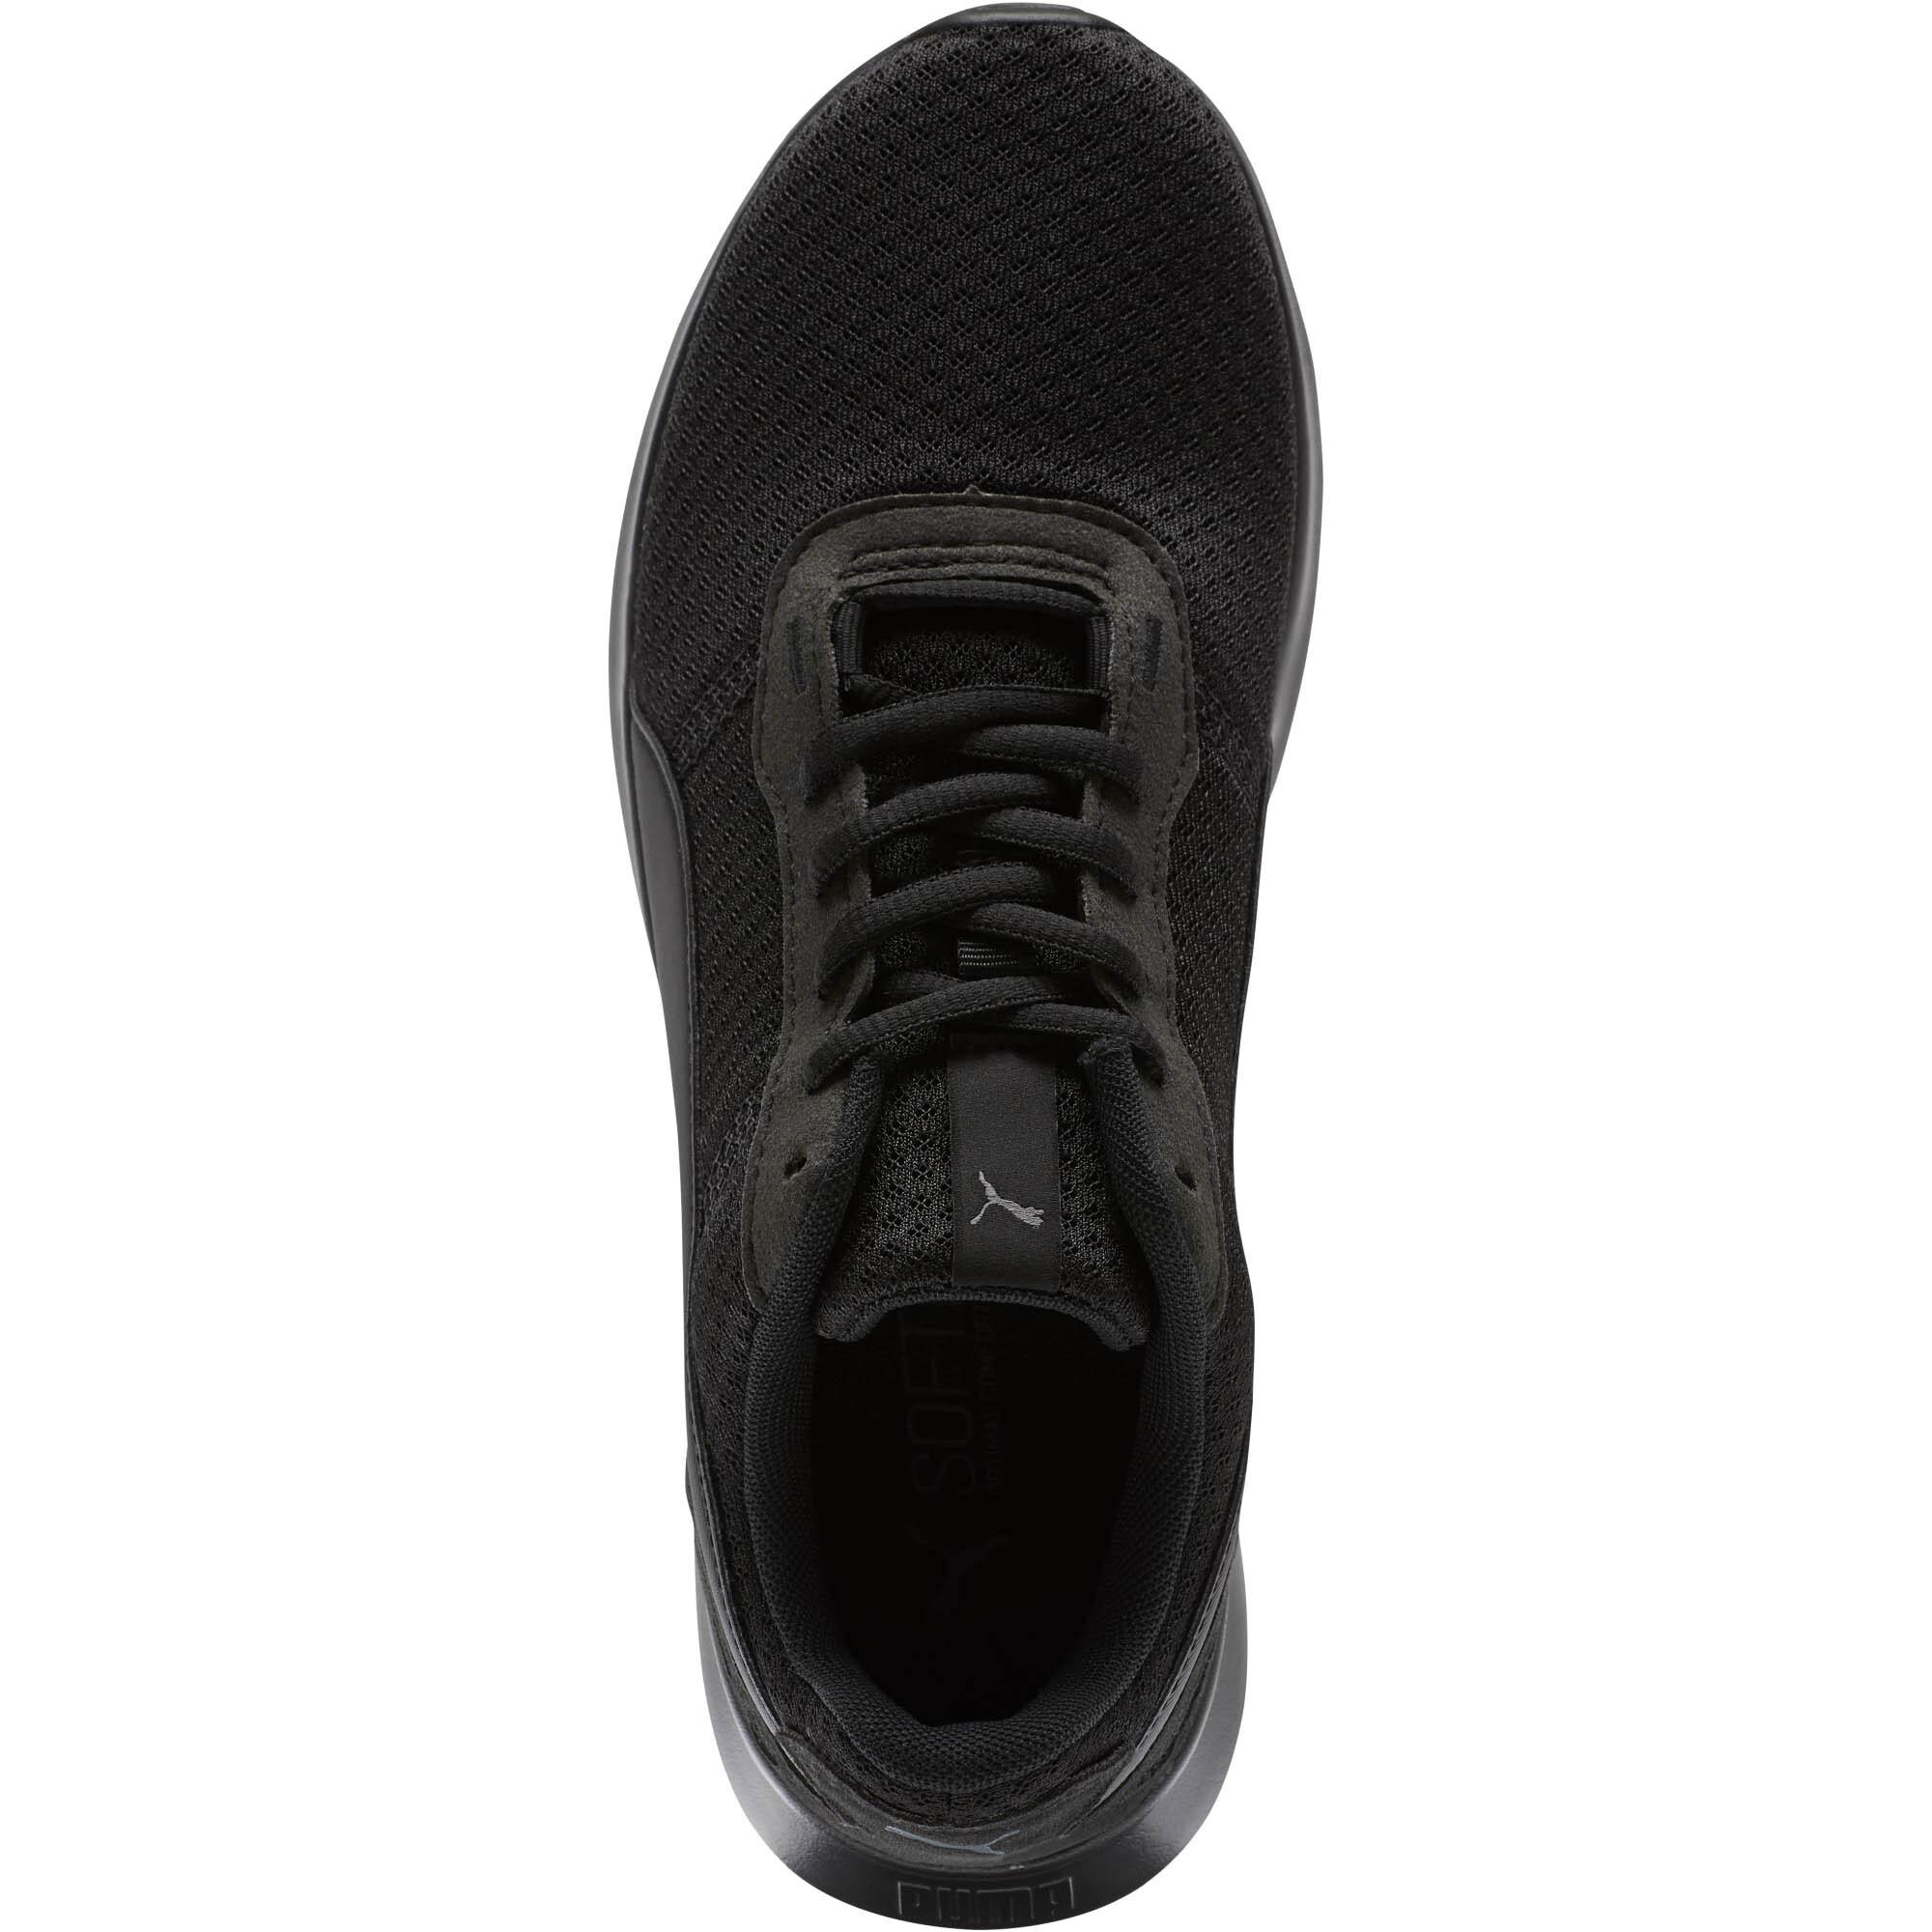 PUMA-ST-Activate-Women-s-Sneakers-Women-Shoe-Basics thumbnail 6